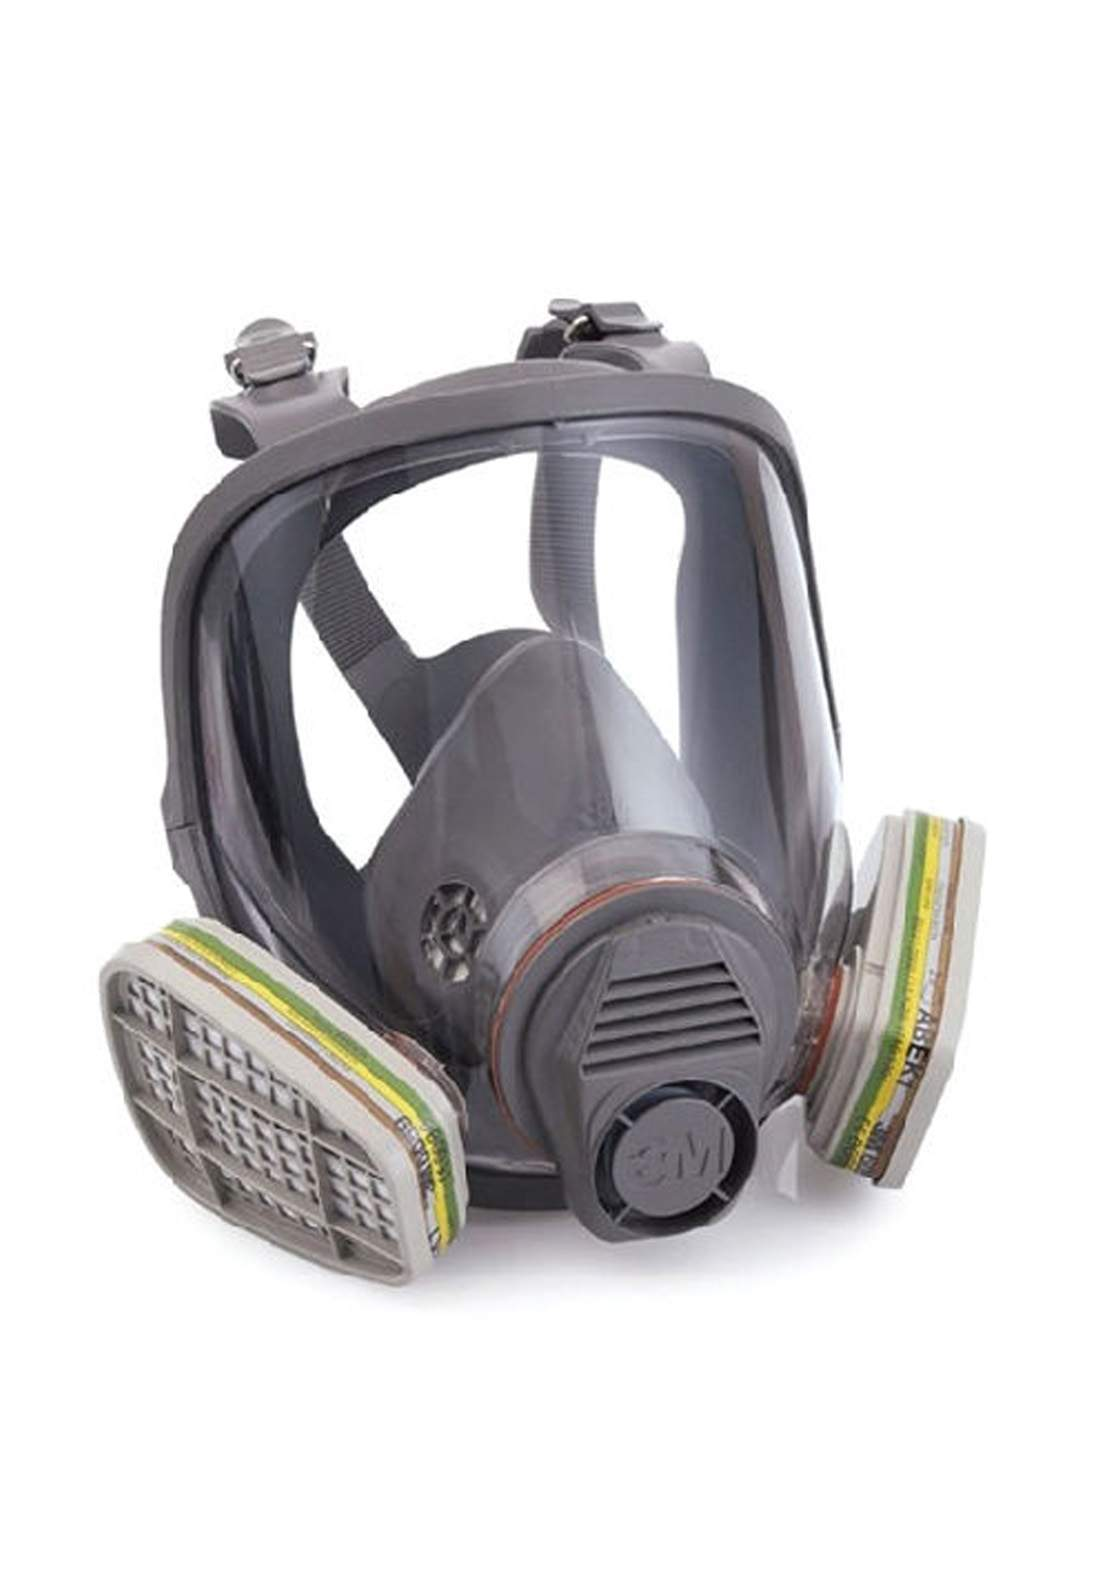 Subul AlHurra Protective Mask 3M 6800 قناع وقاية